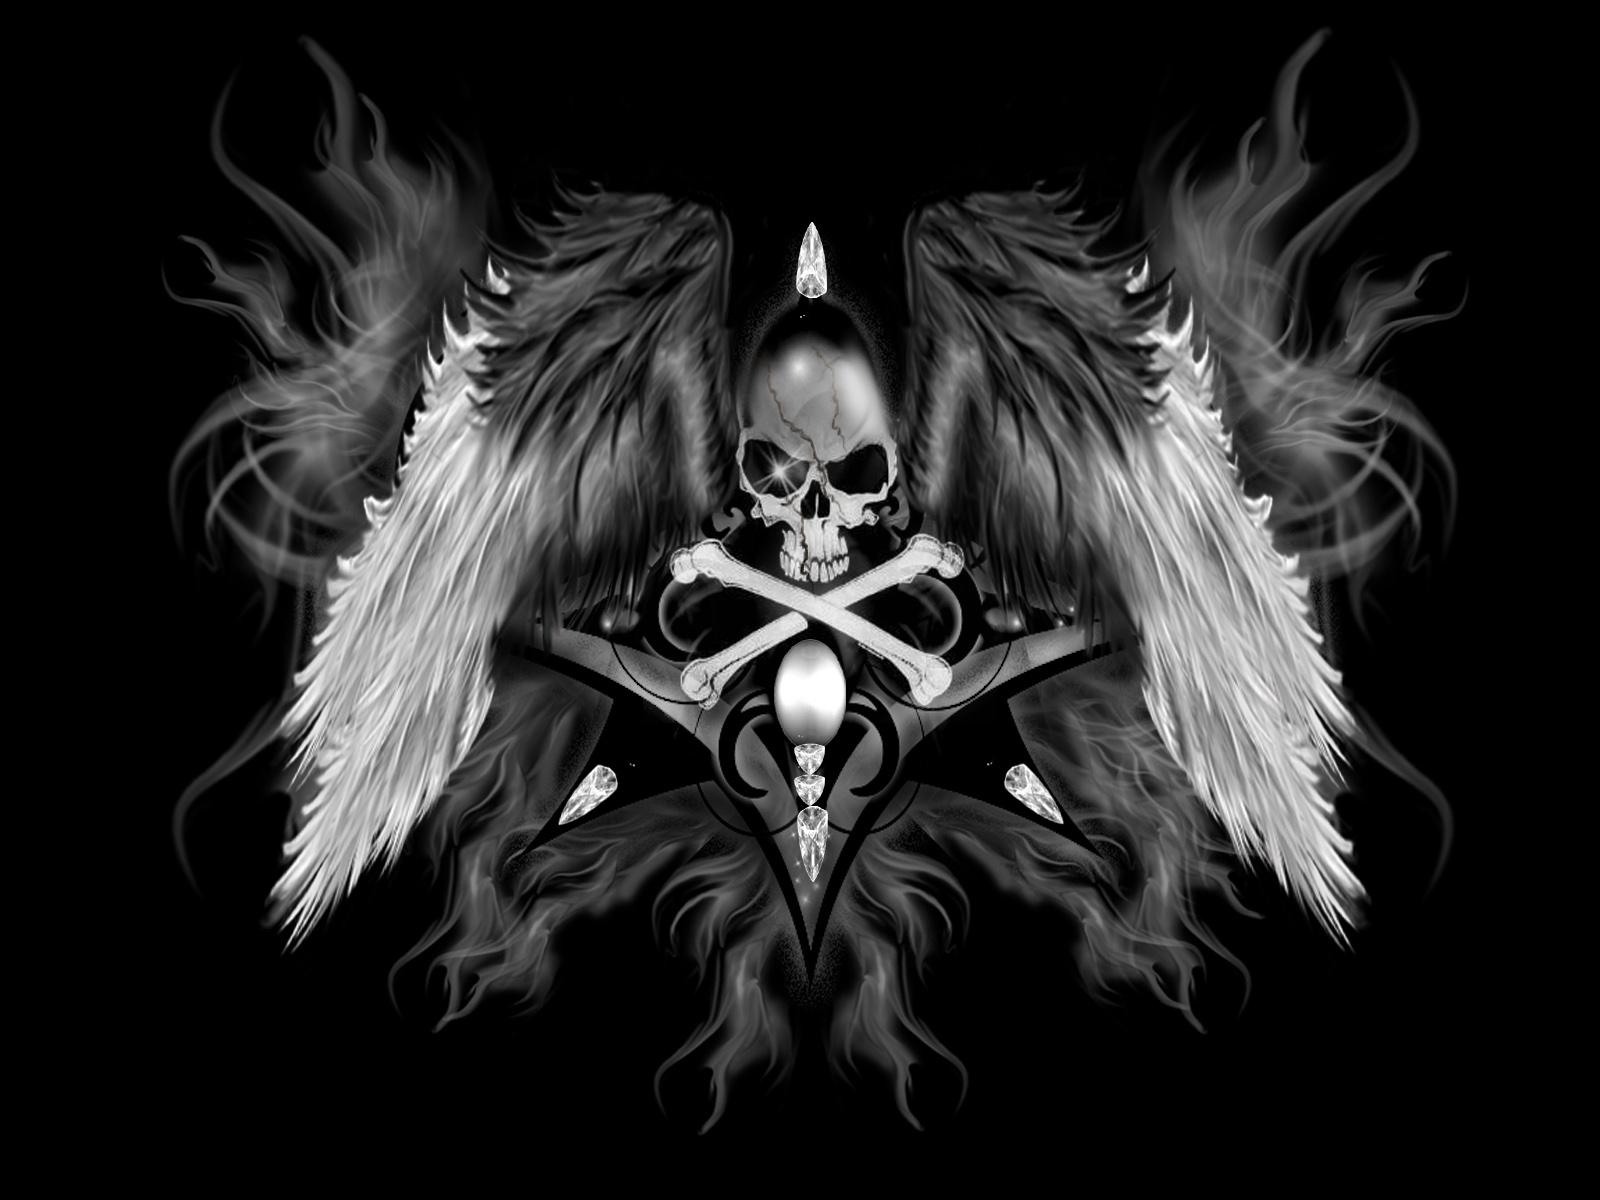 Free Download Death Wallpaper Gothic Skull Hd Wallpapers Da